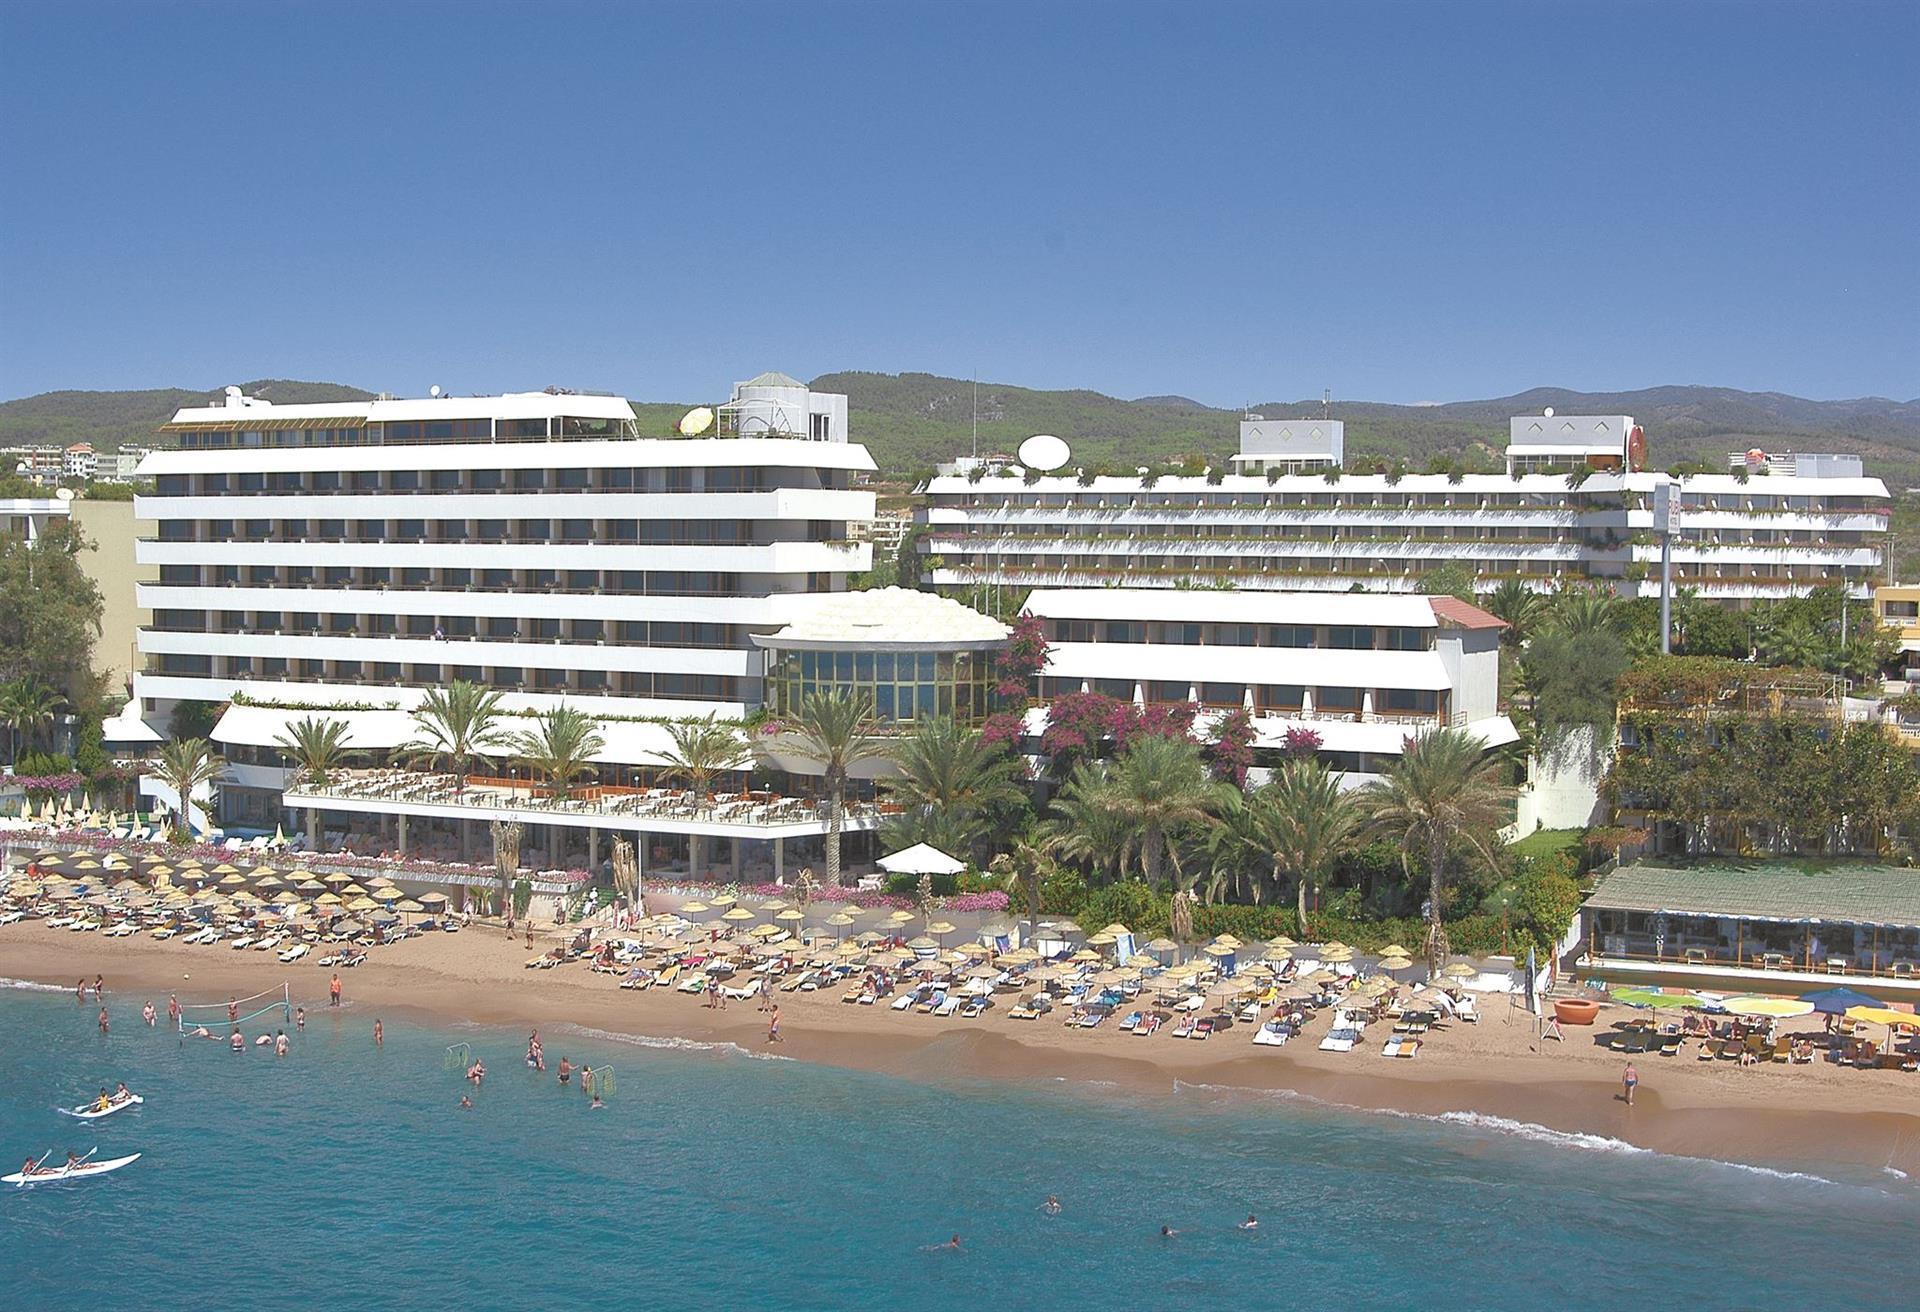 отель 5 звезд сочи на берегу моря